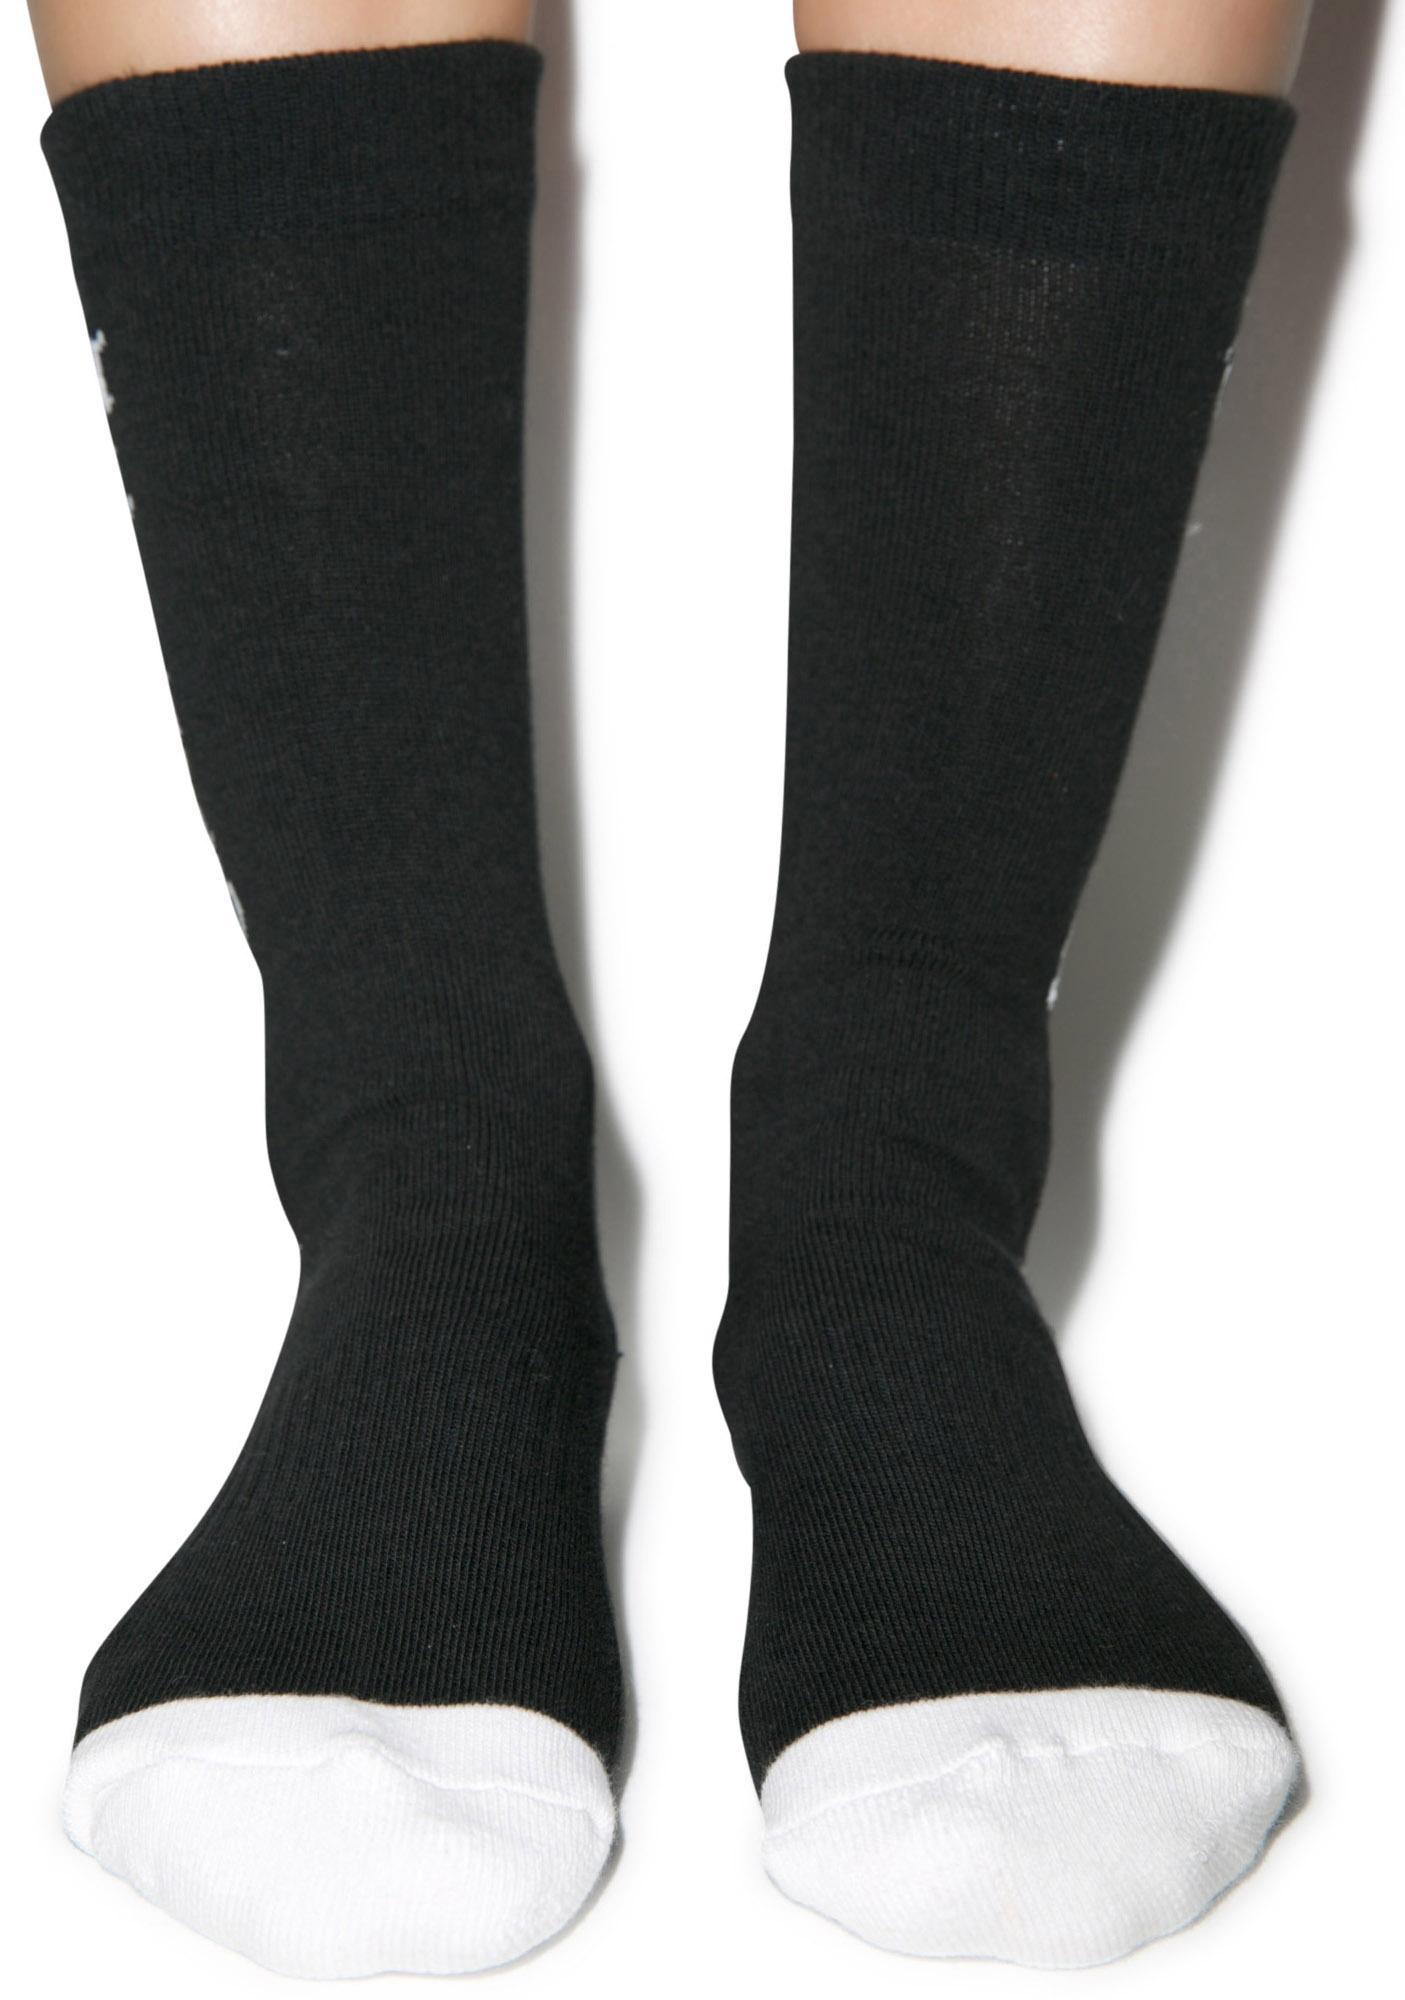 Blackcraft Unholy Socks